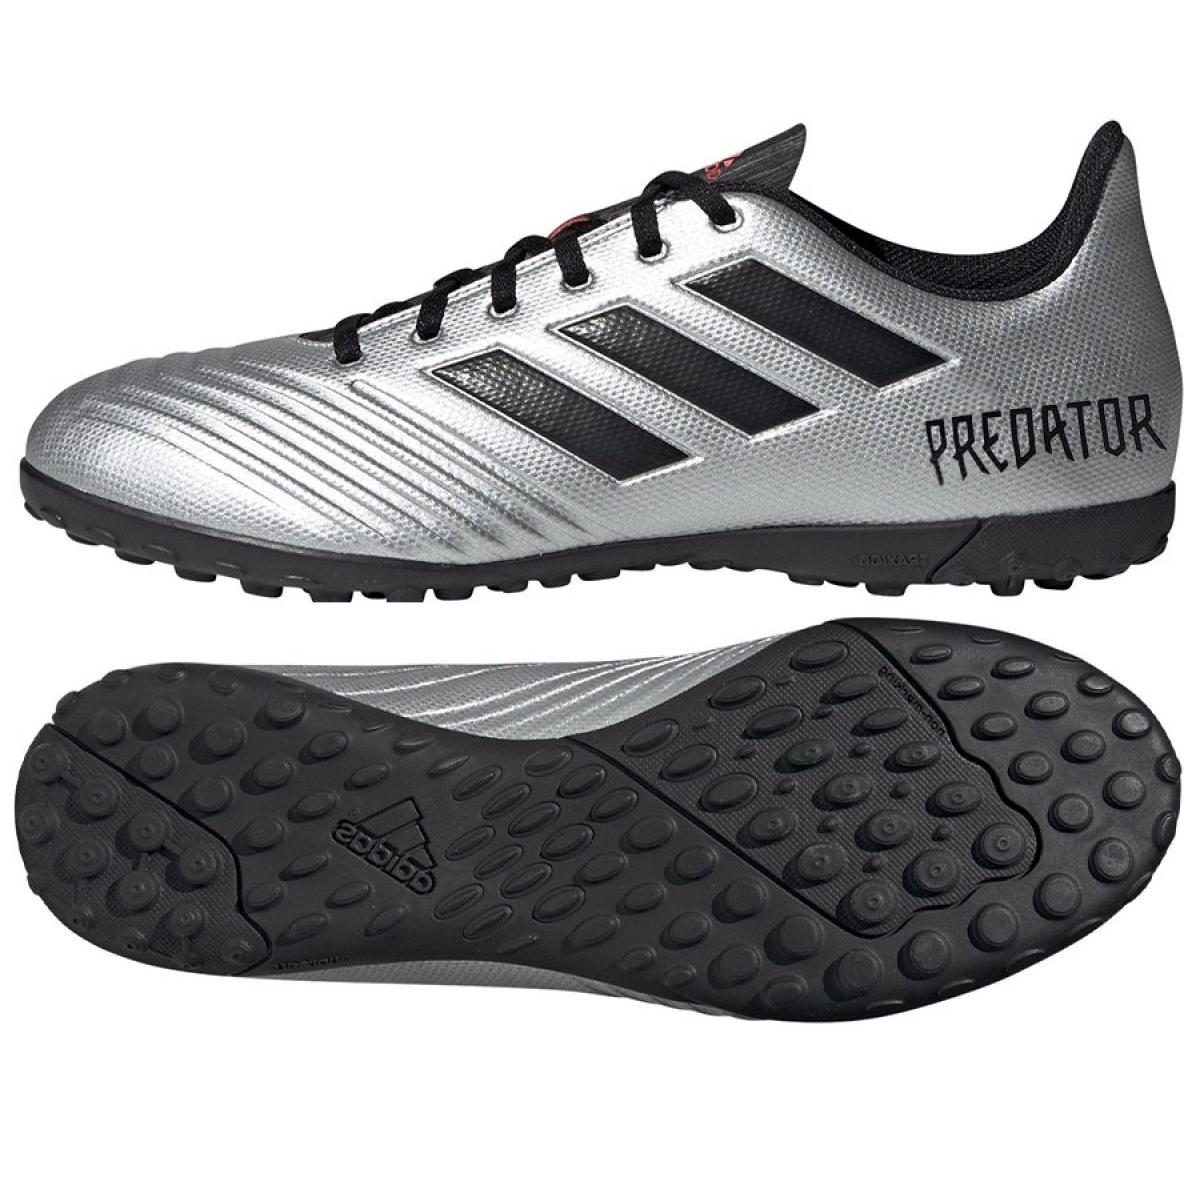 Chaussures de foot adidas Predator 19.4 Tf M F35634